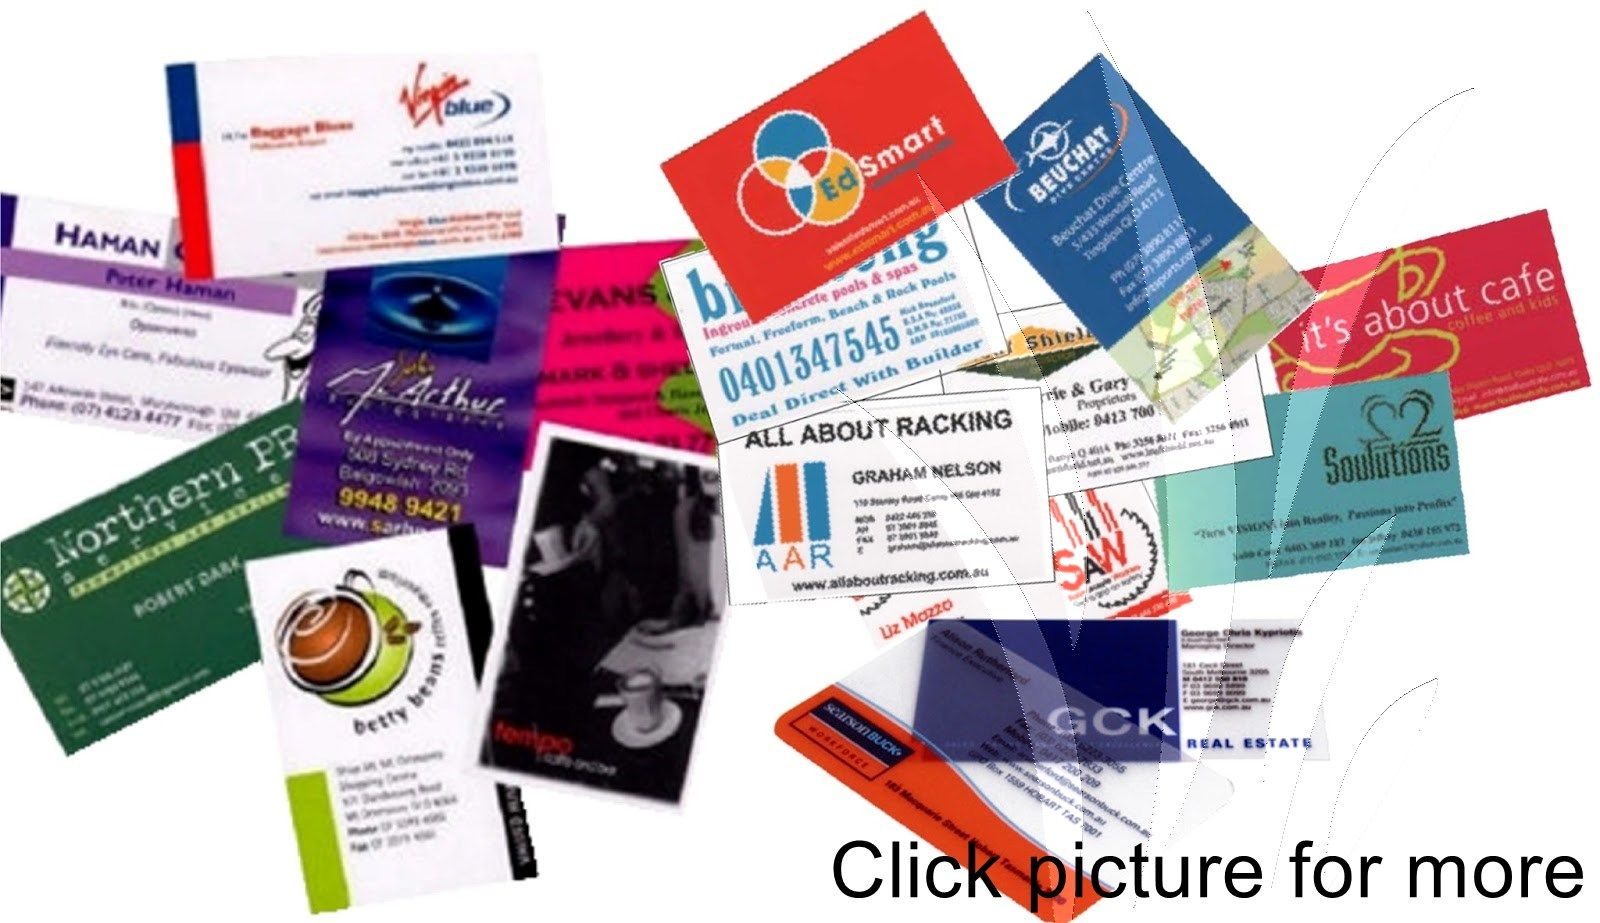 Business Flyer Cards Business Flyer Card Business Cards Flyers Business Card Flyer Temp Printing Business Cards Business Cards And Flyers Company Folder Design